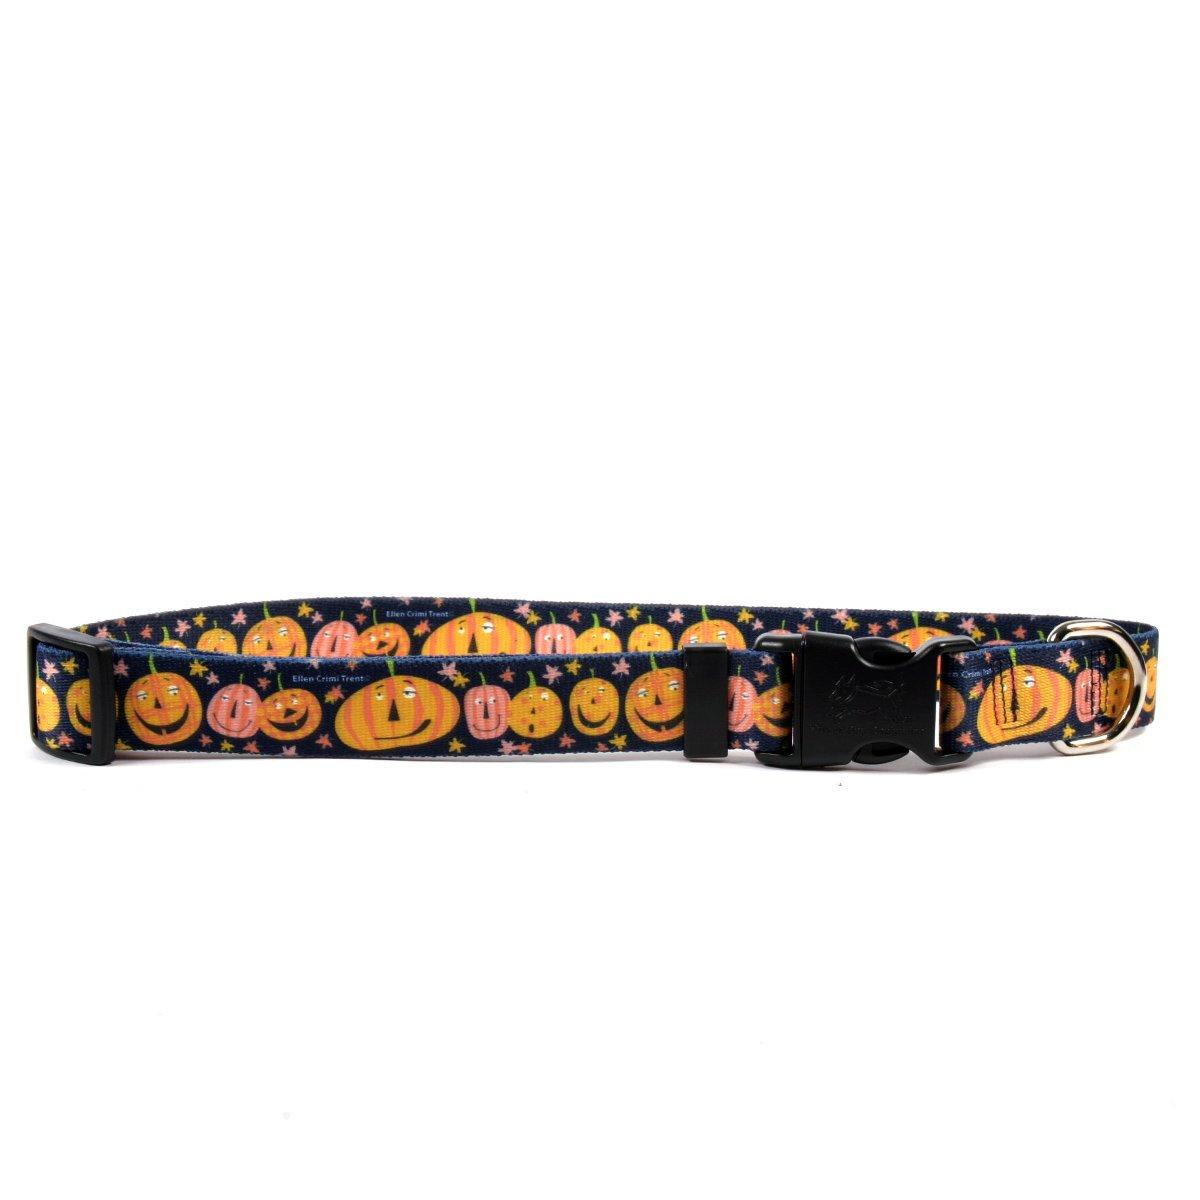 Yellow Dog Design Pumpkin Party Dog Collar, Medium-1'' Wide fits Neck Sizes 14 to 20'' Wide